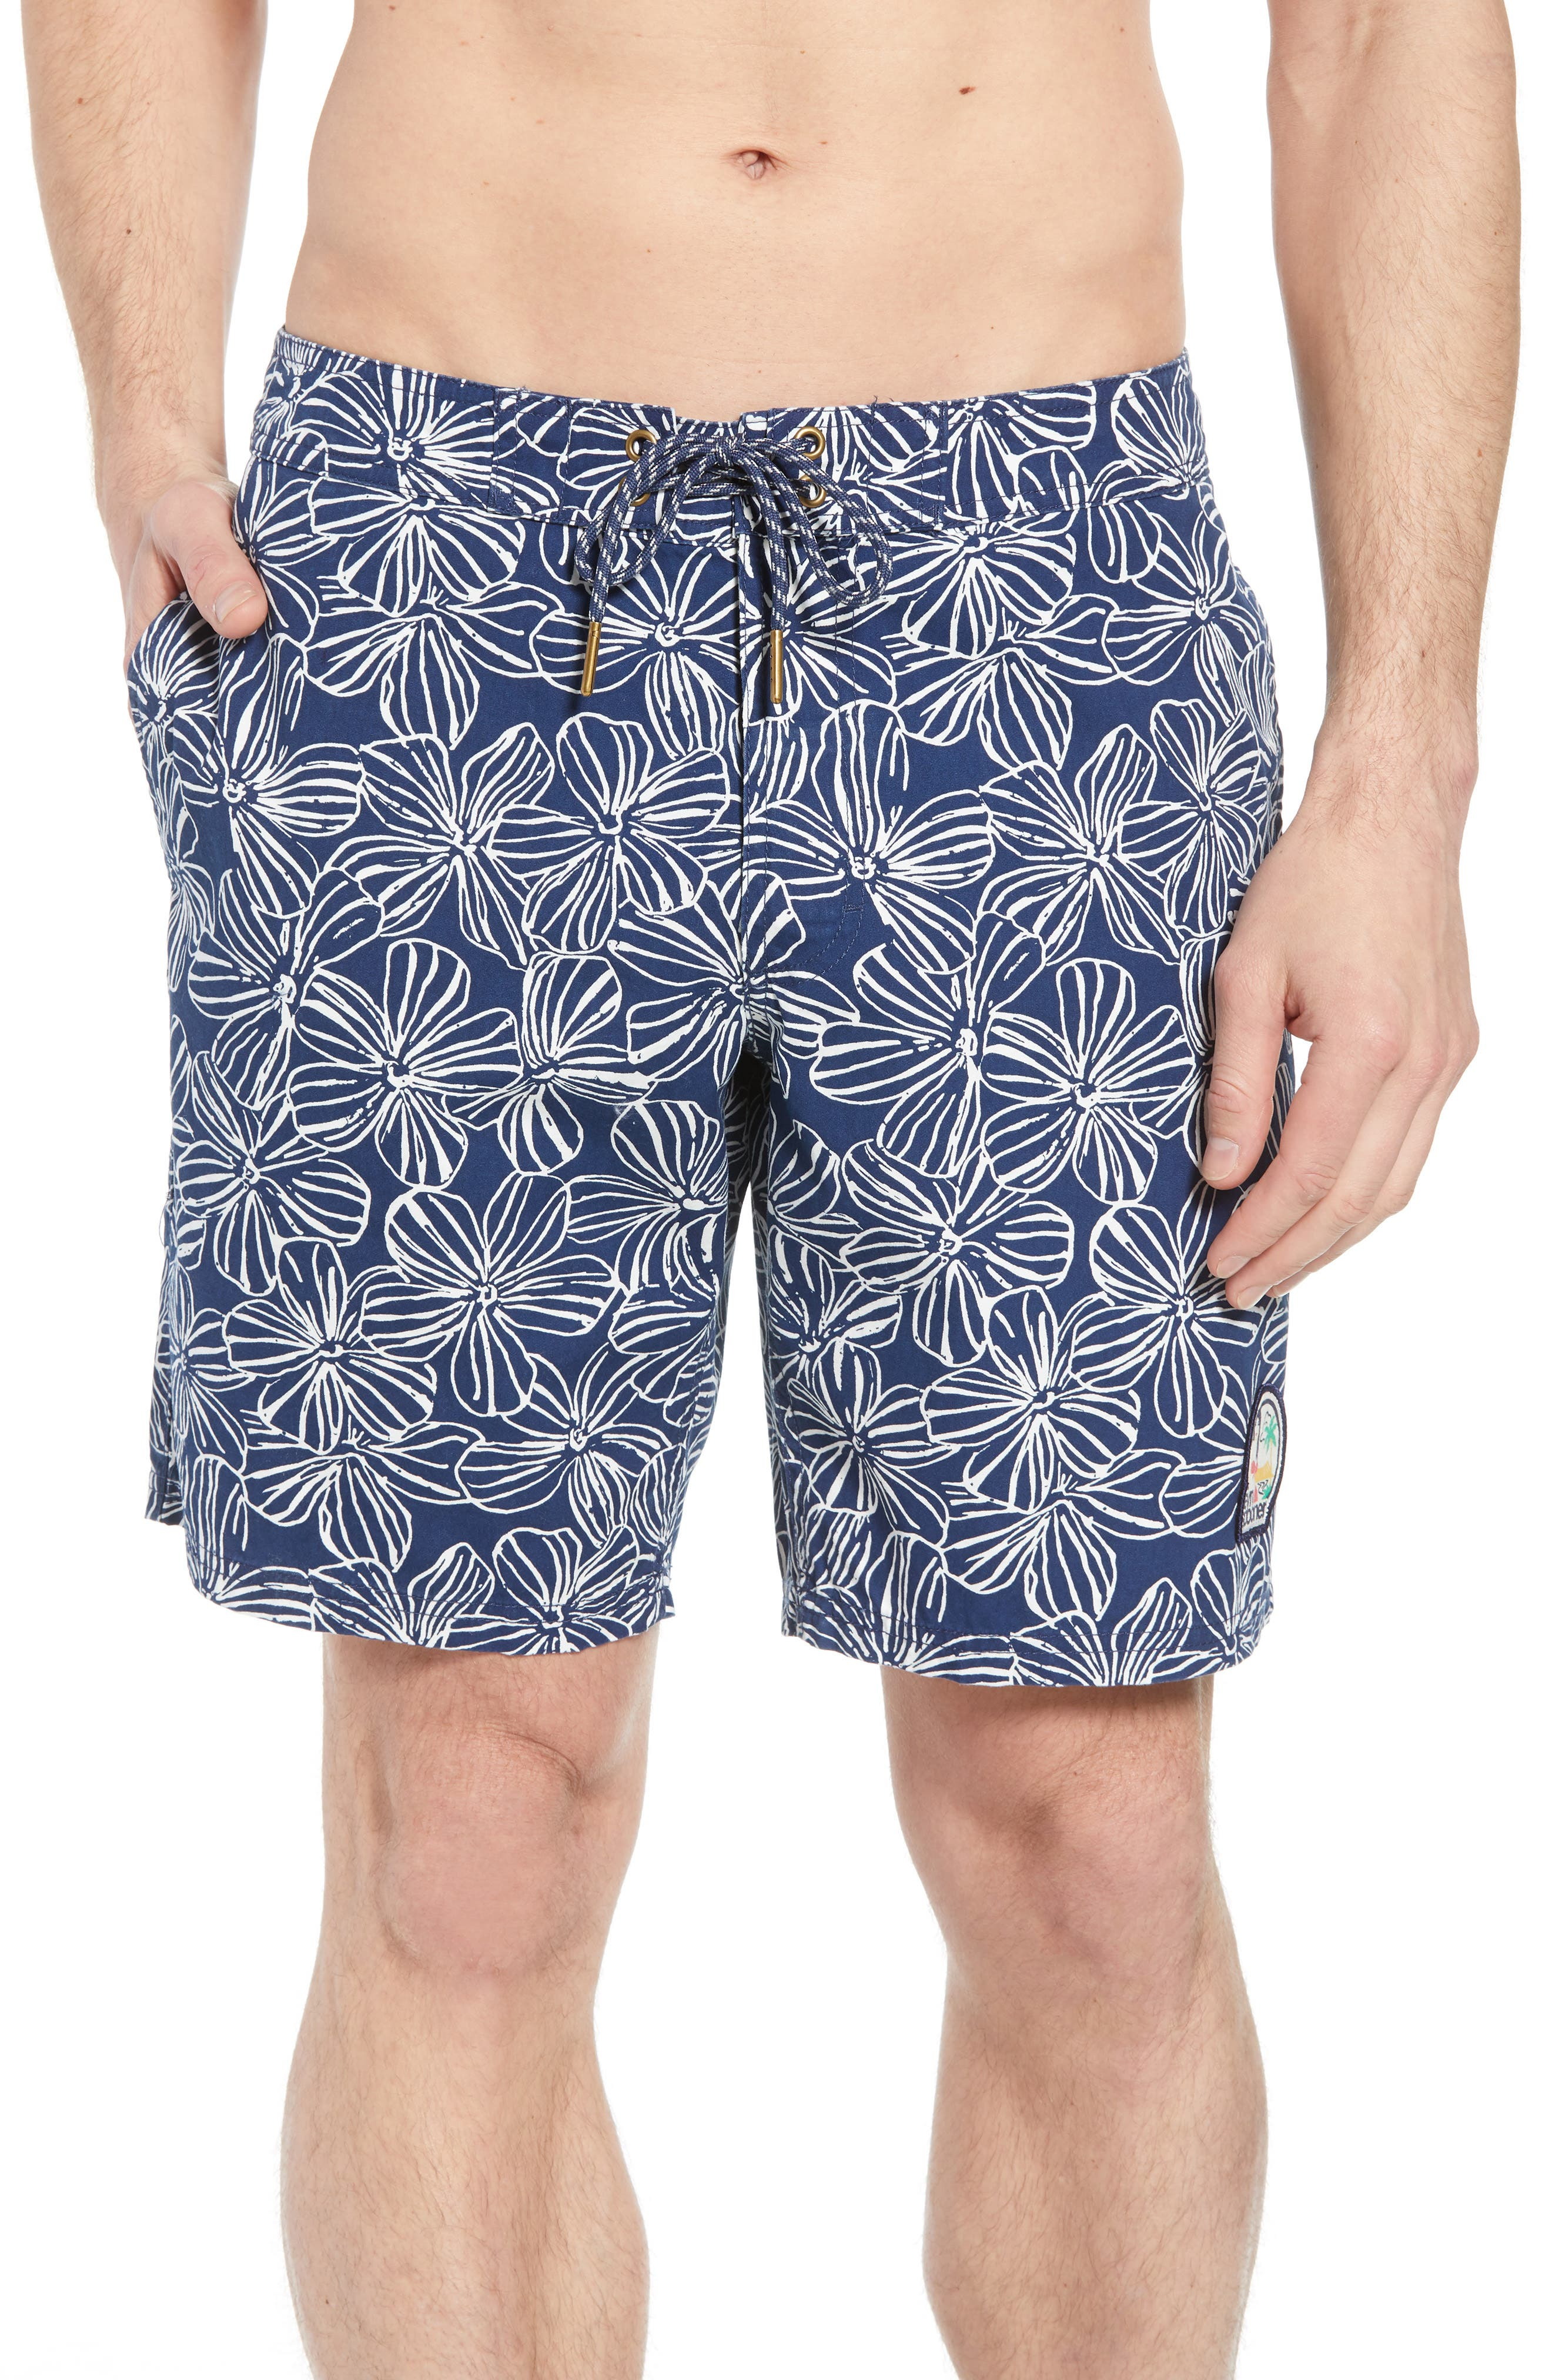 Mala Melia Regular Fit Board Shorts,                             Main thumbnail 1, color,                             BLUE